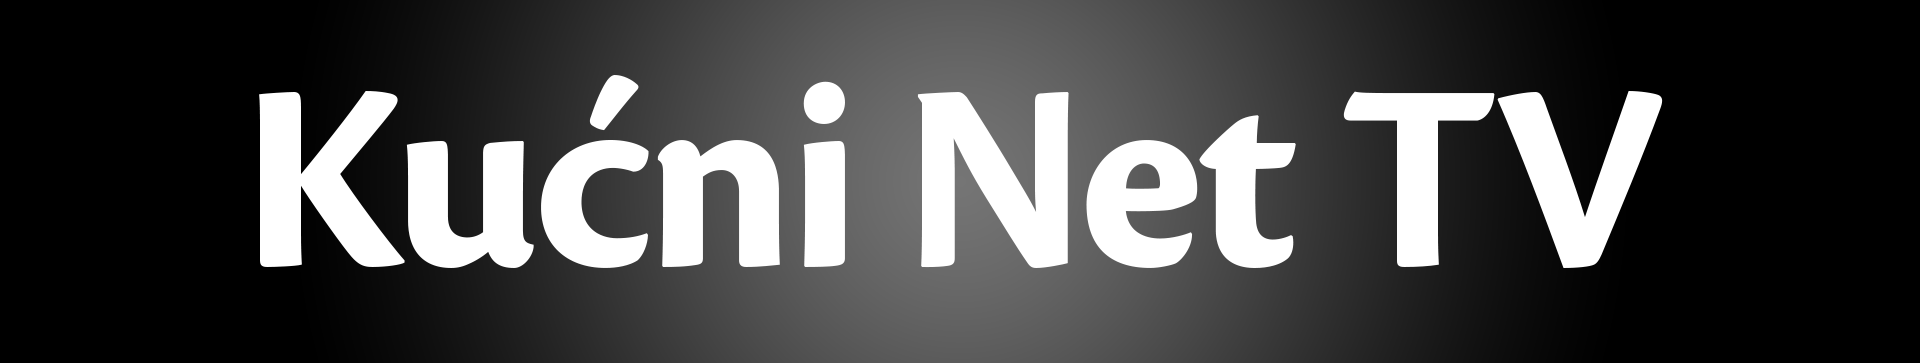 kucniTV-transparent4